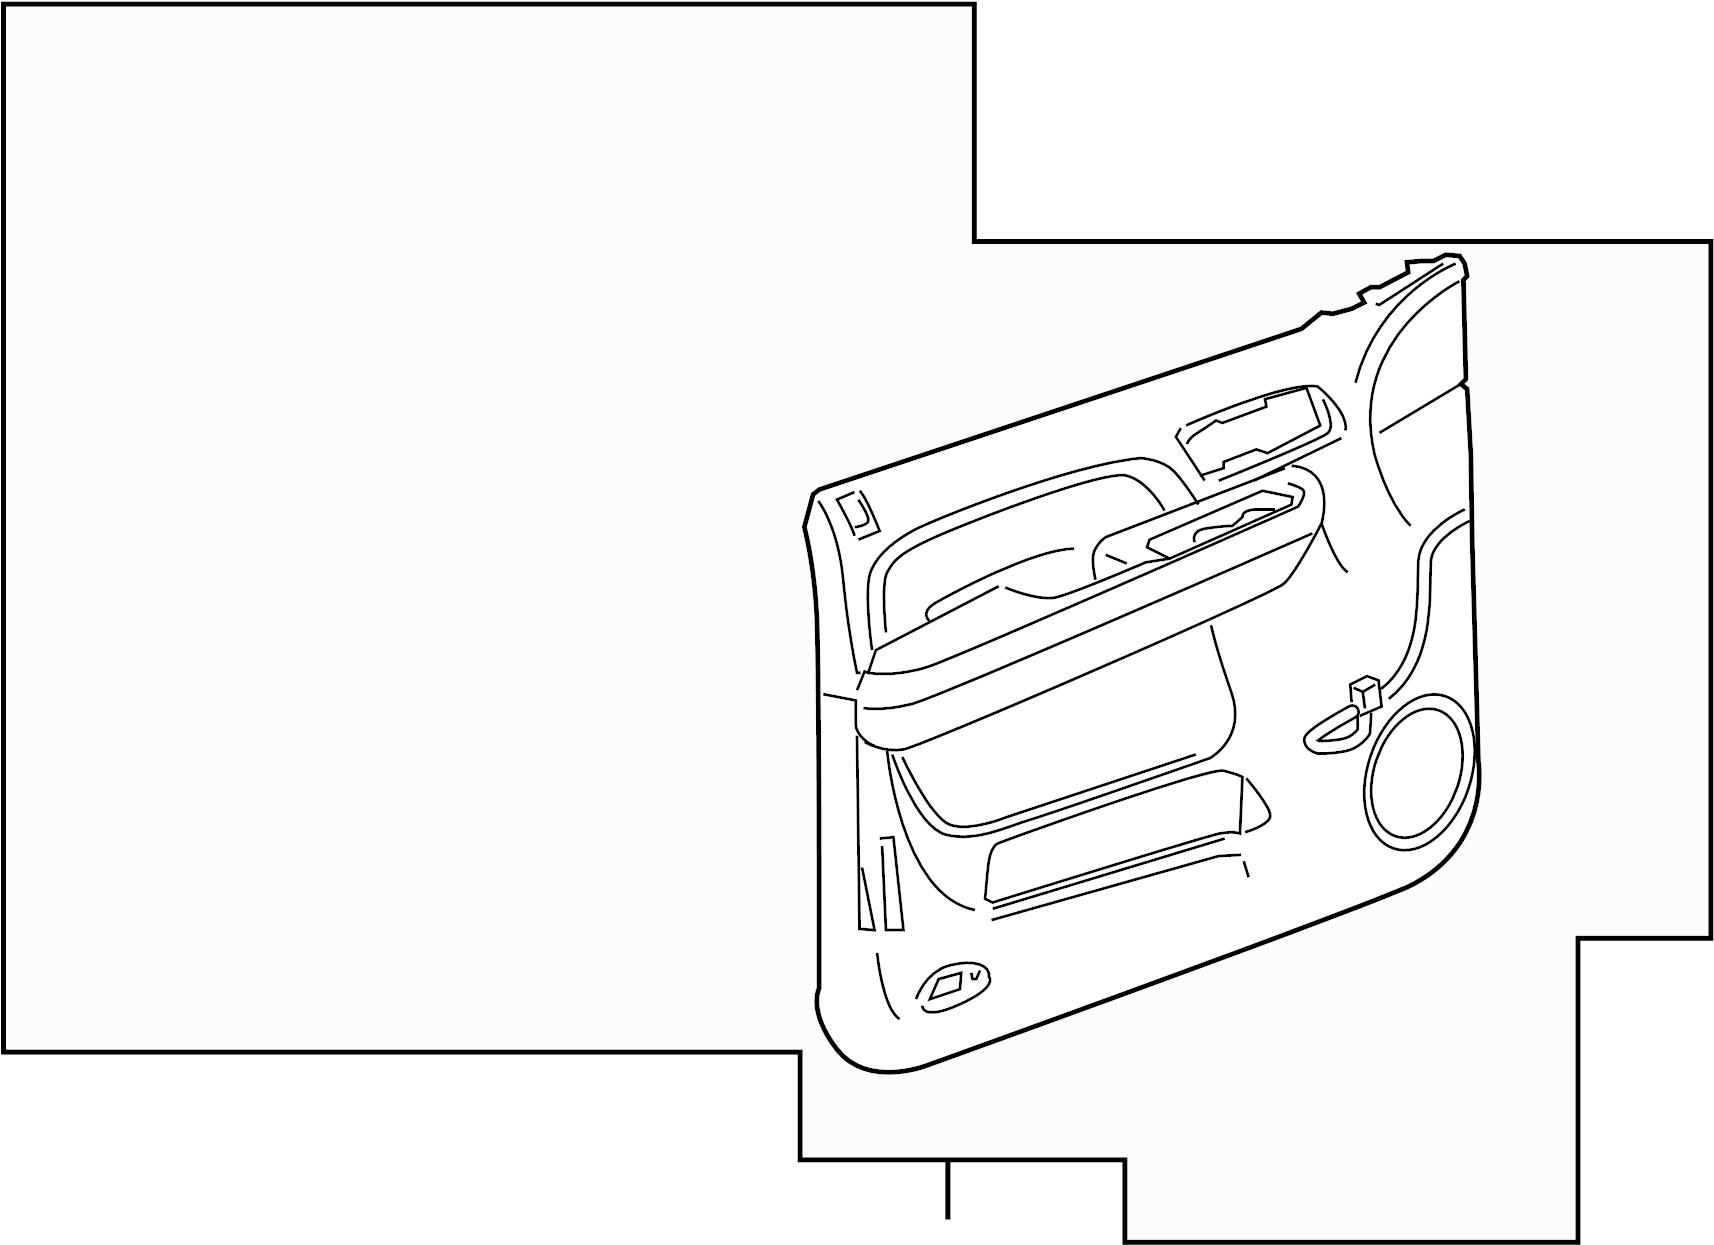 2013 gmc yukon sle door trim panel  panel  chevrolet  gmc